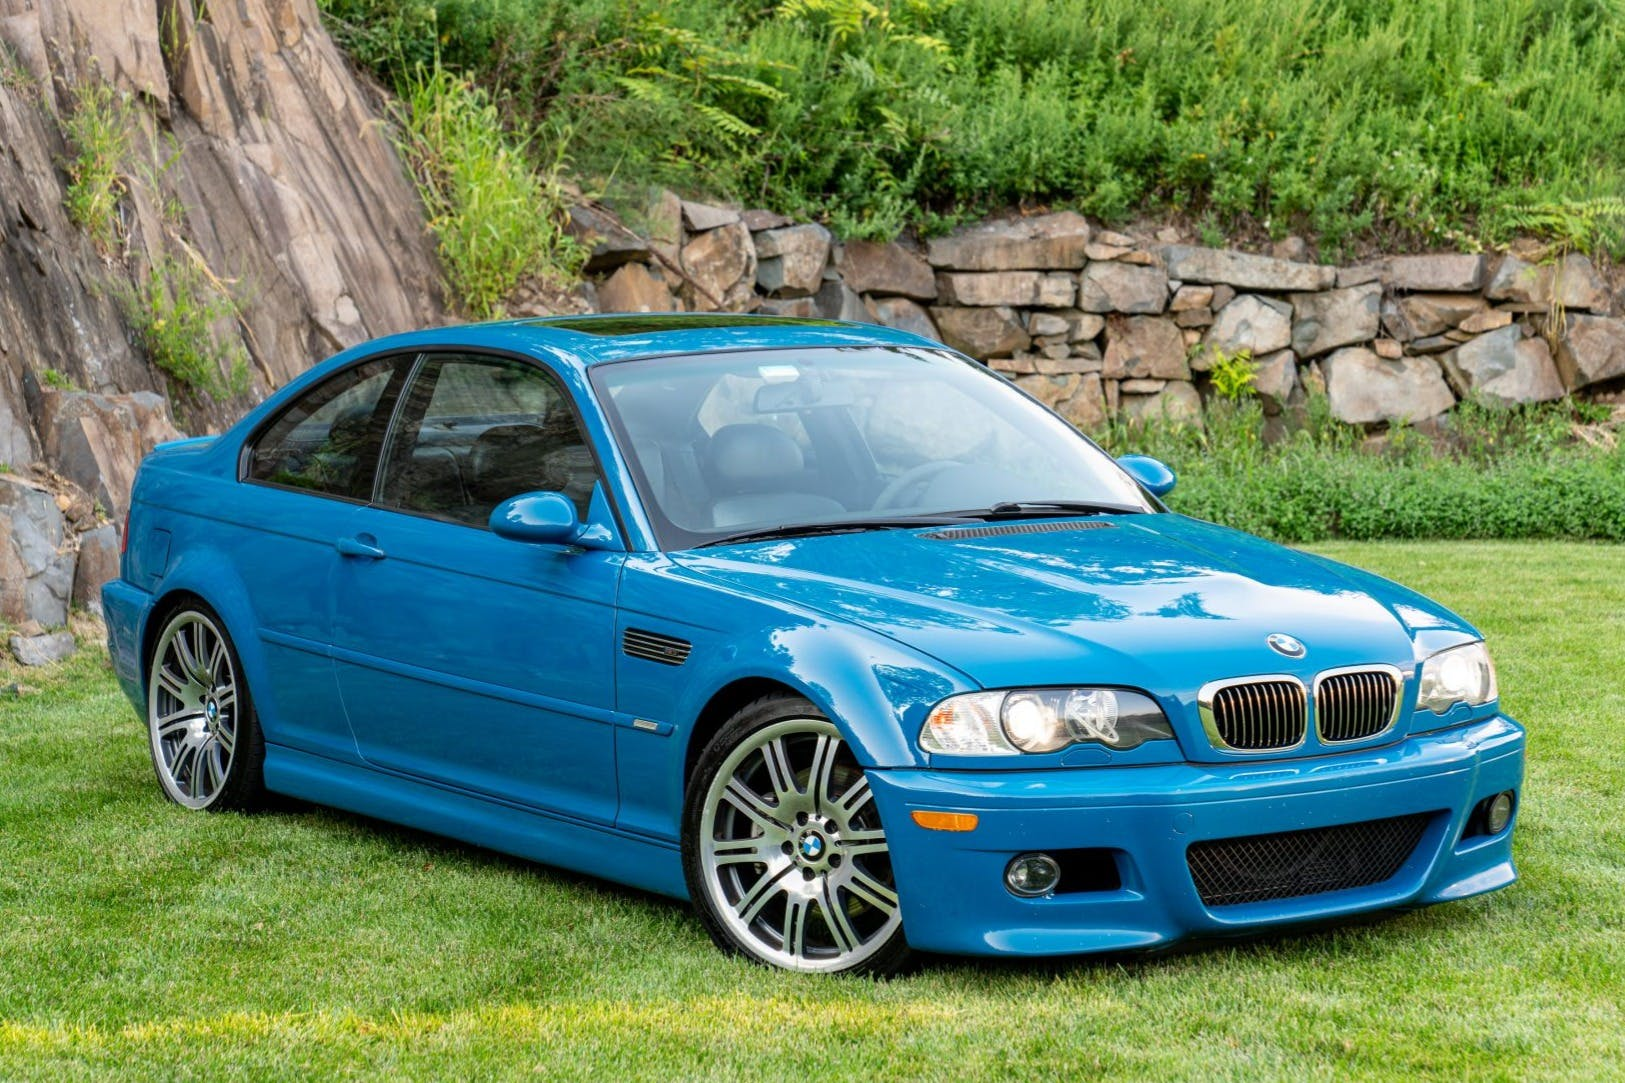 2002 Bmw M3 Coupe 6 Speed Vin Wbsbl934x2jr12966 Classic Com